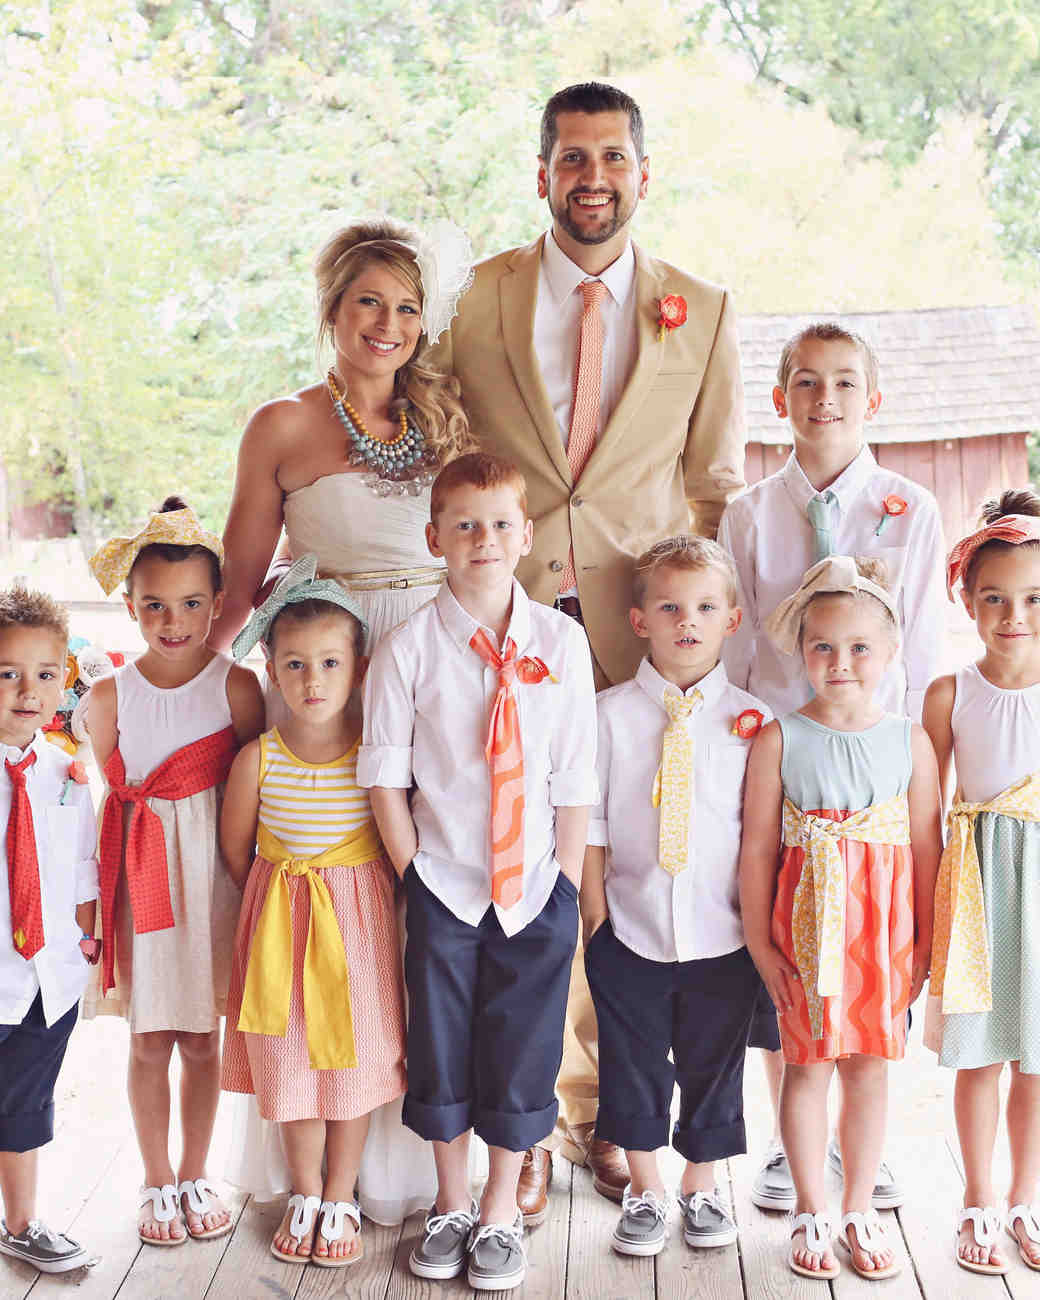 real-weddings-nichole-matthew-wd0413-f-album-154.jpg